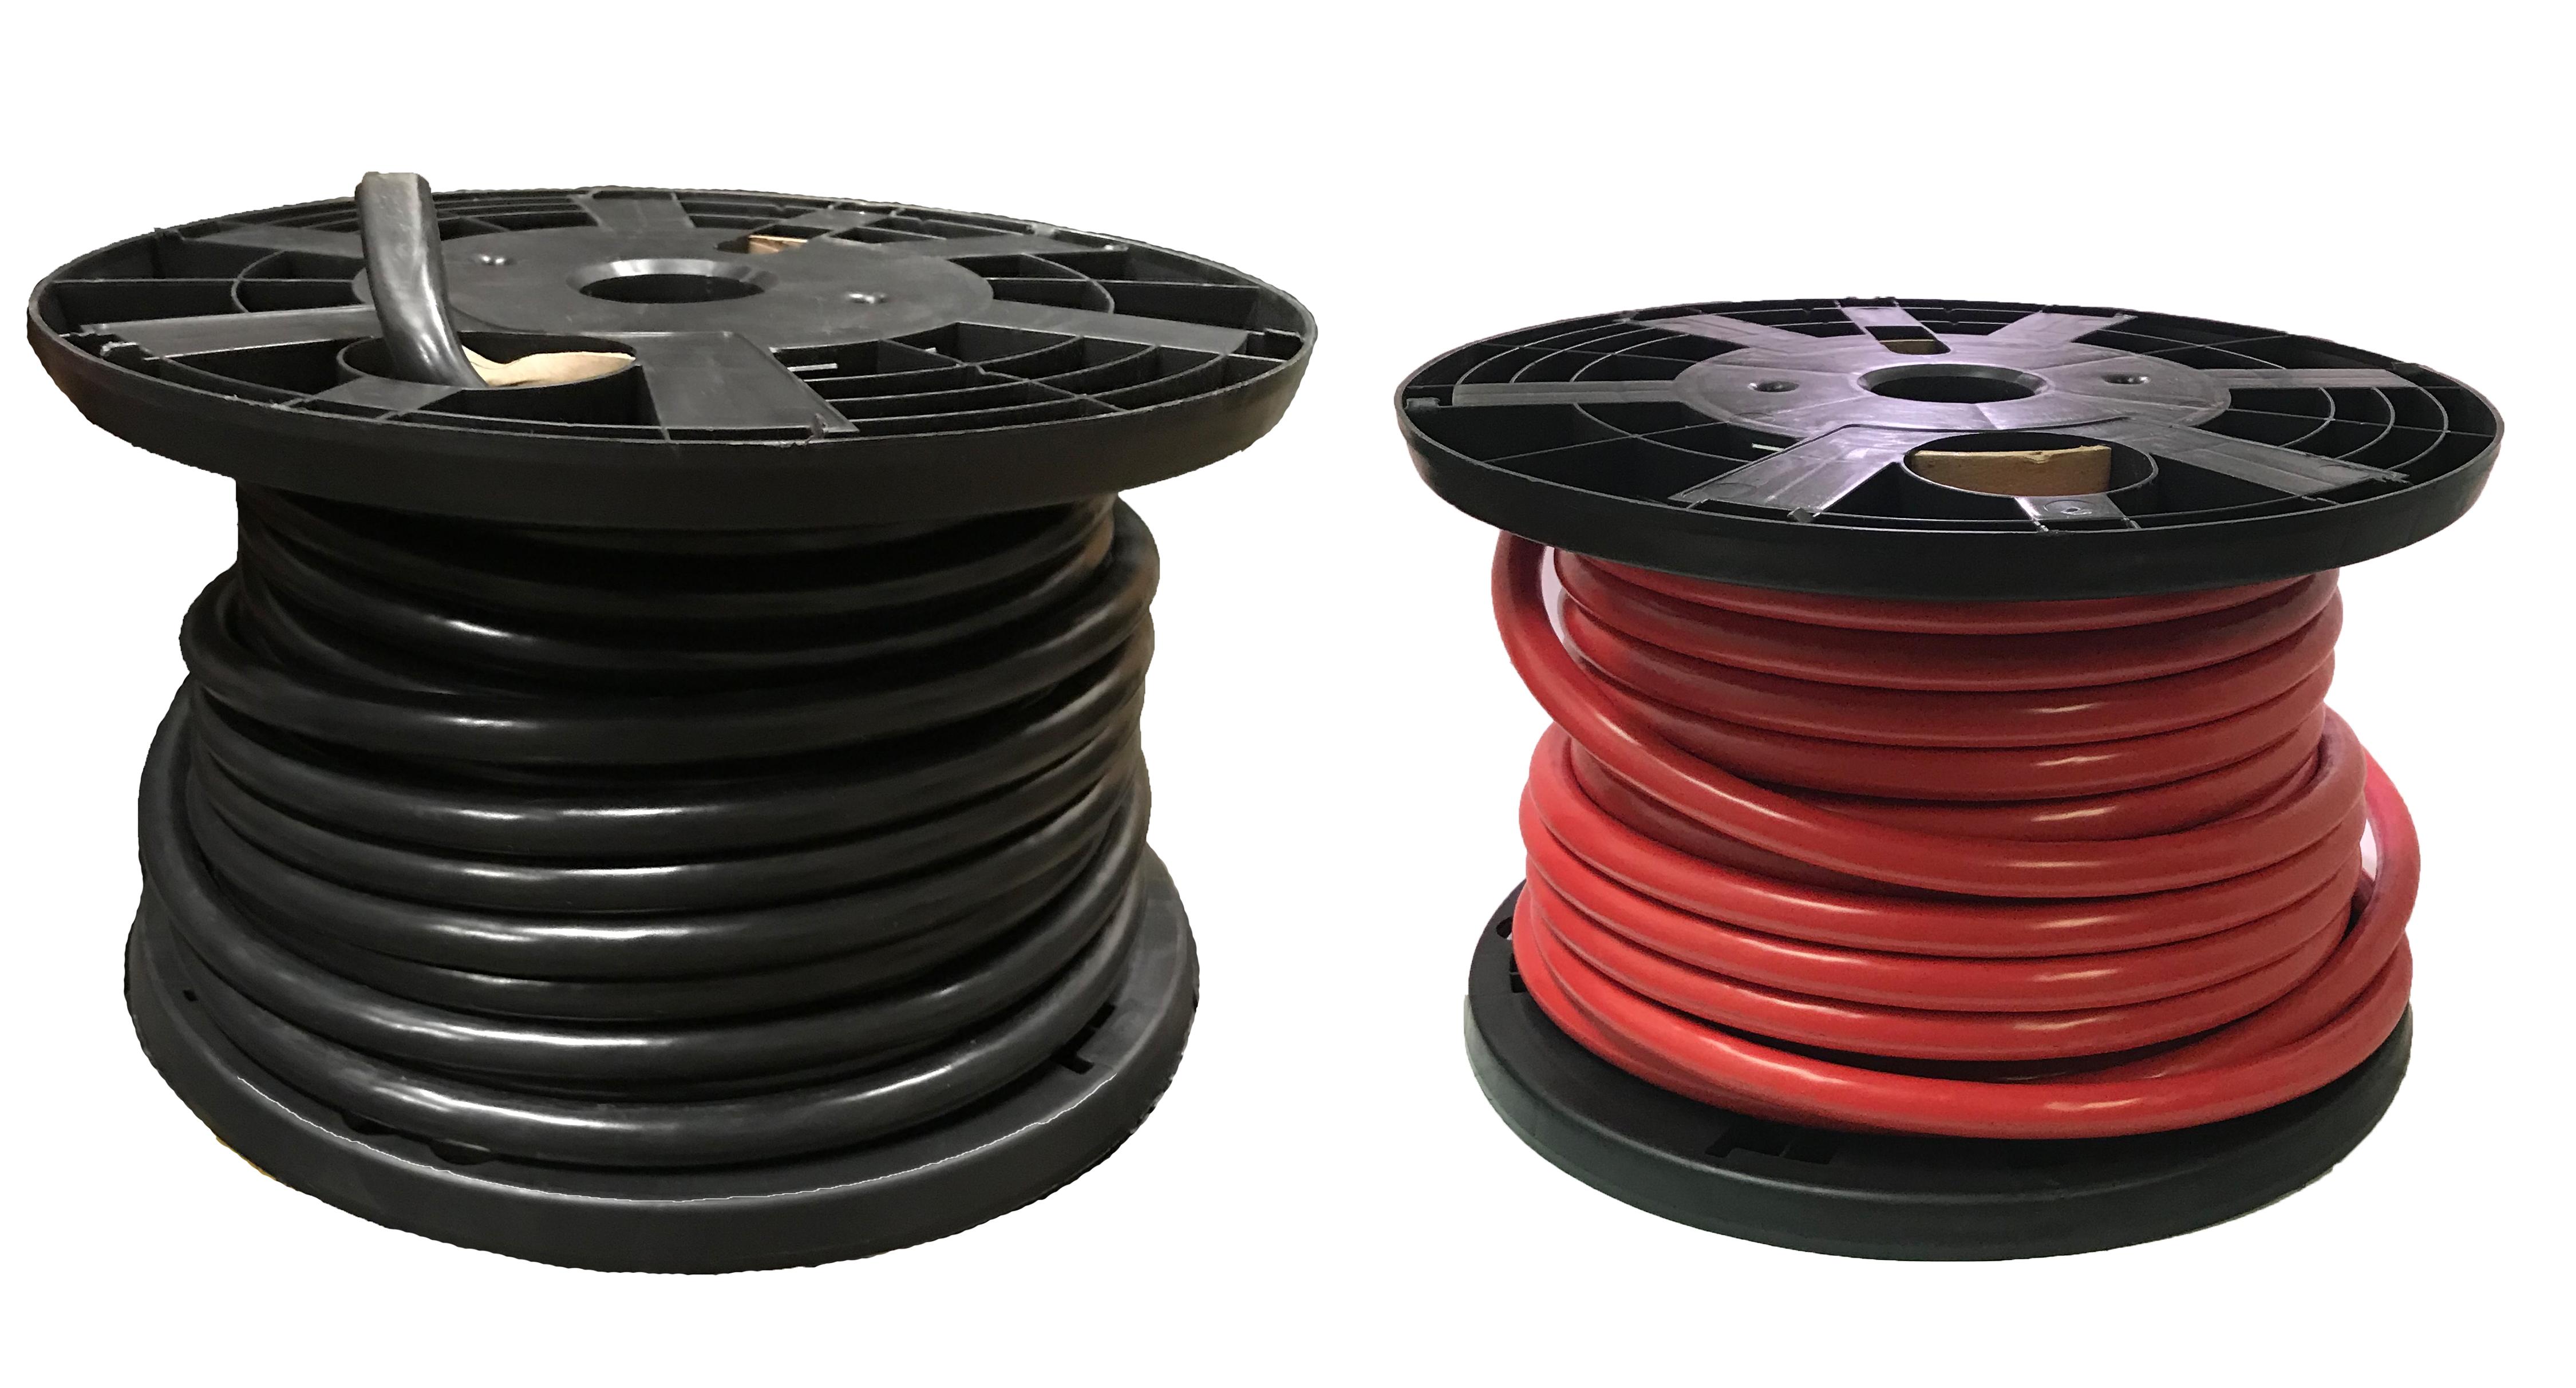 Automotive Battery Cable, Automotive Starter Wire, Starter Cable, Battery Wire